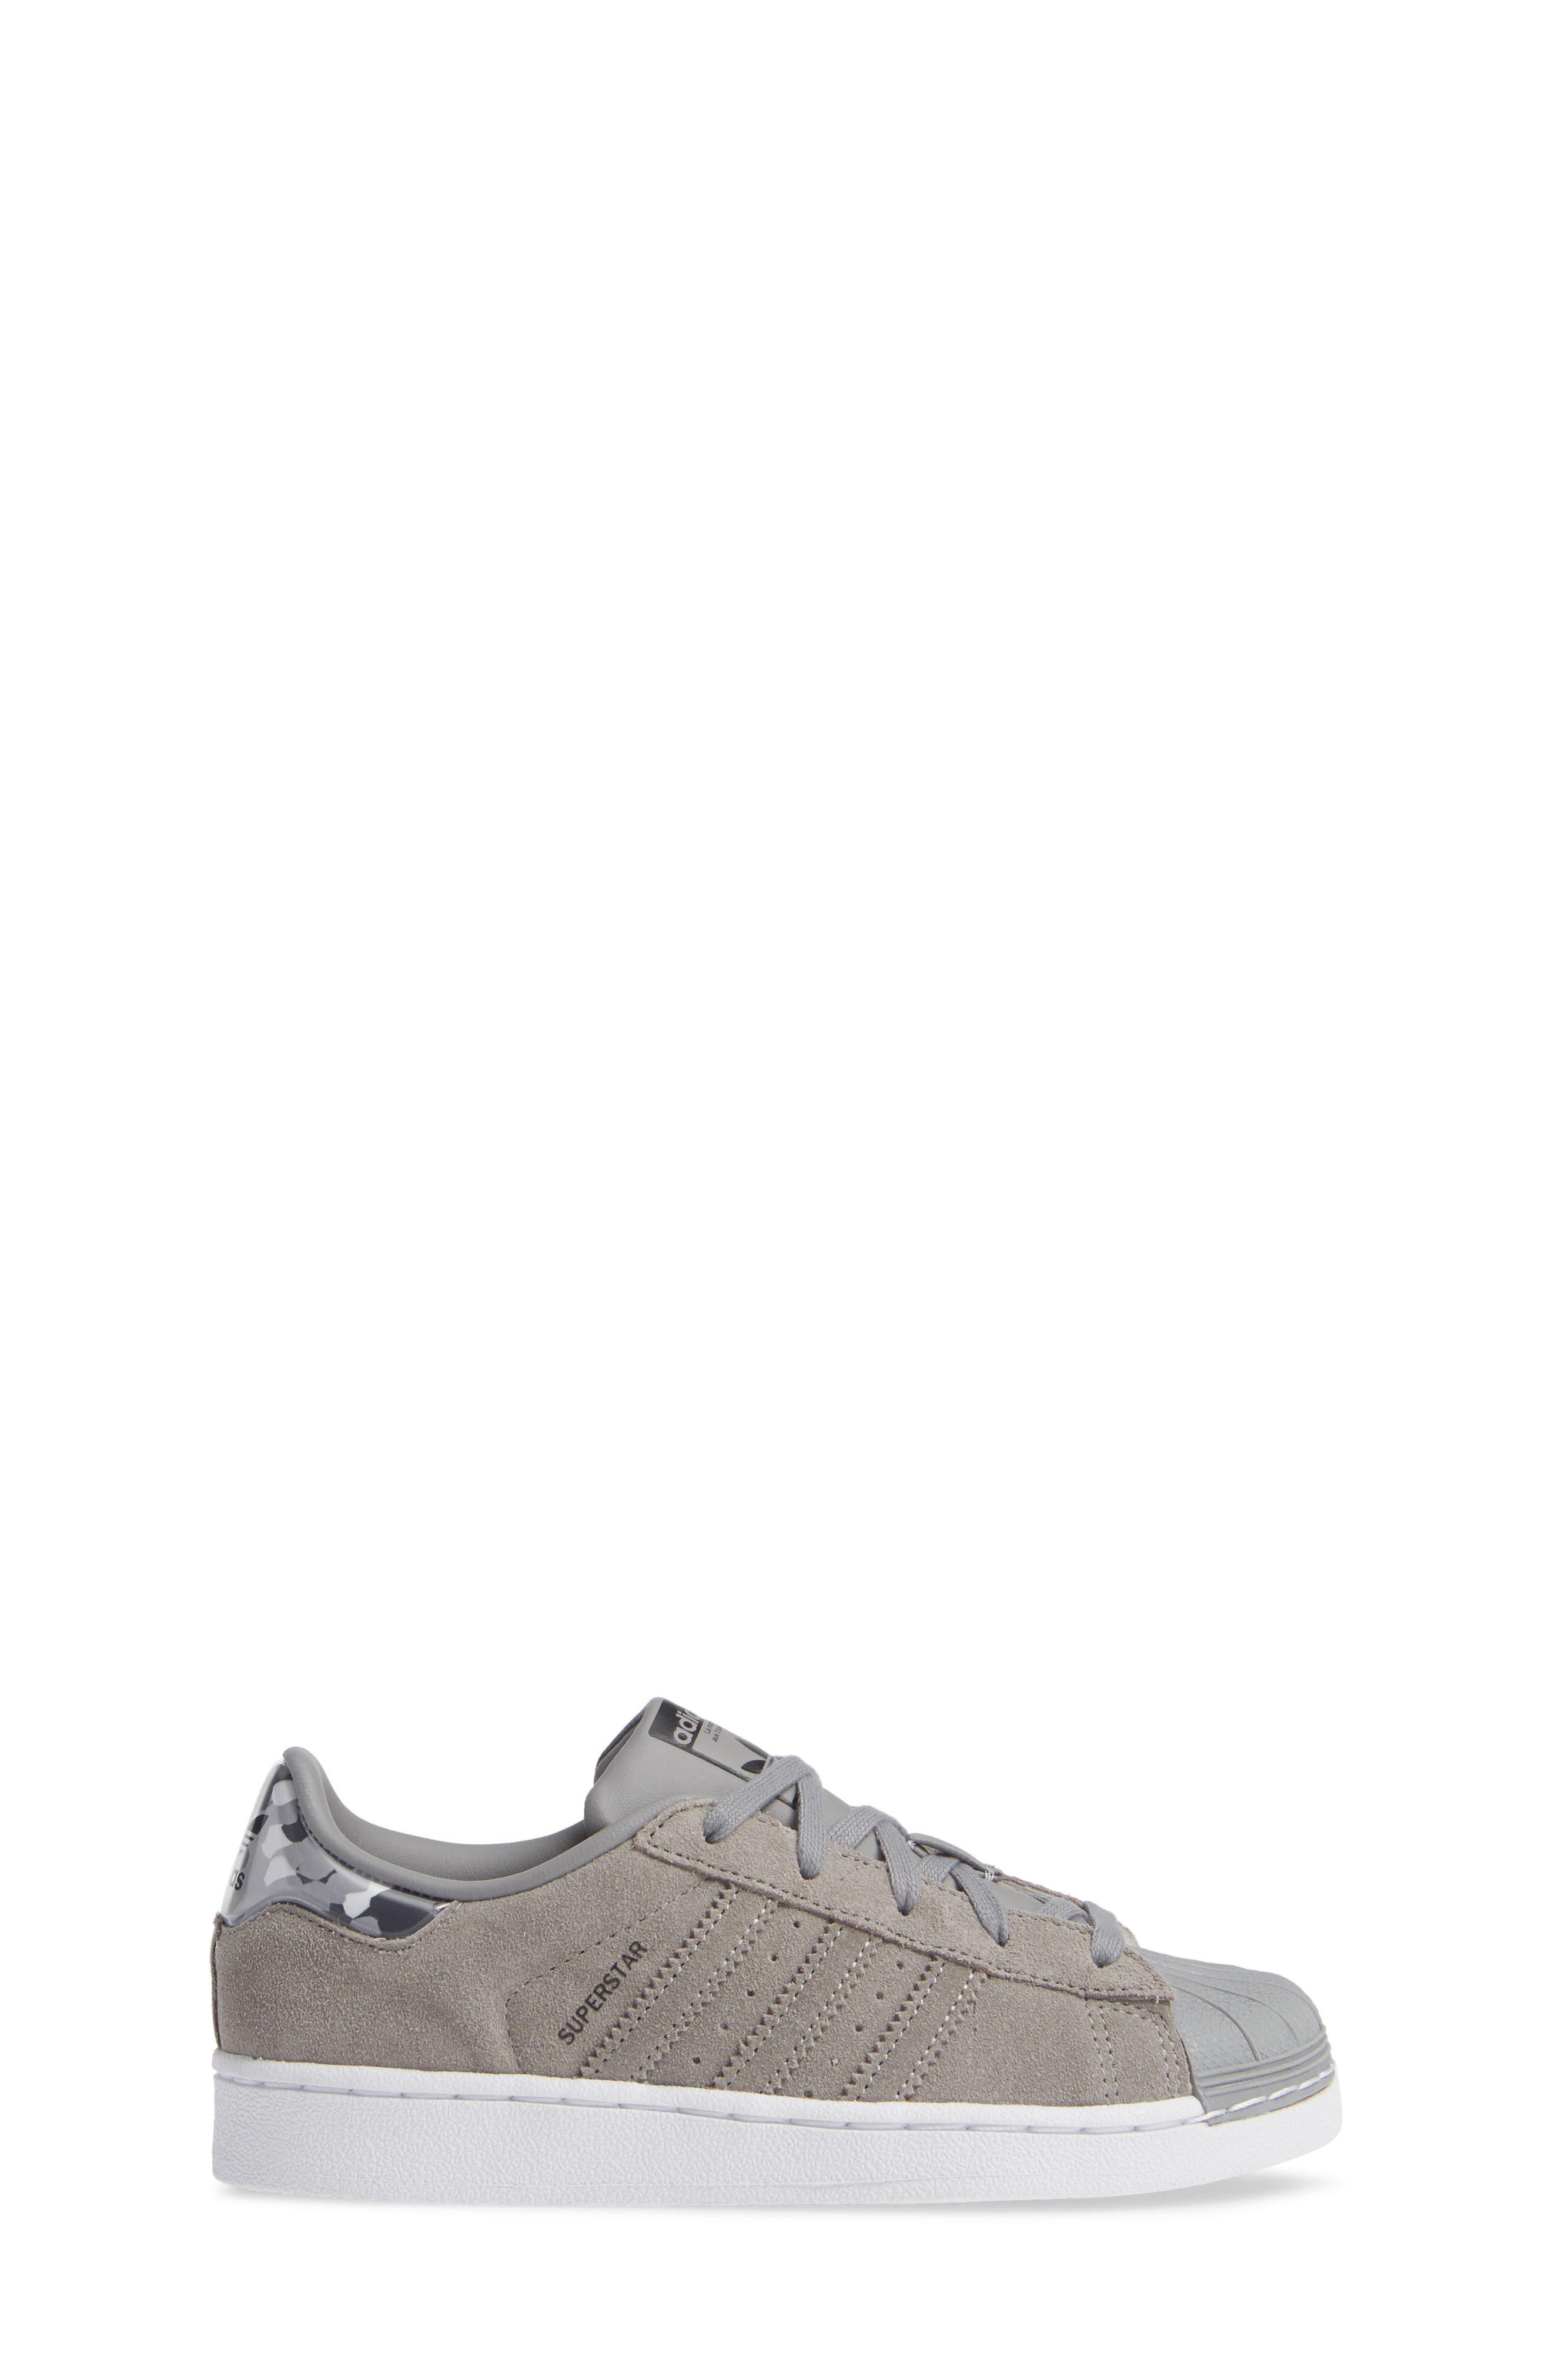 Superstar Low Top Sneaker,                             Alternate thumbnail 3, color,                             020